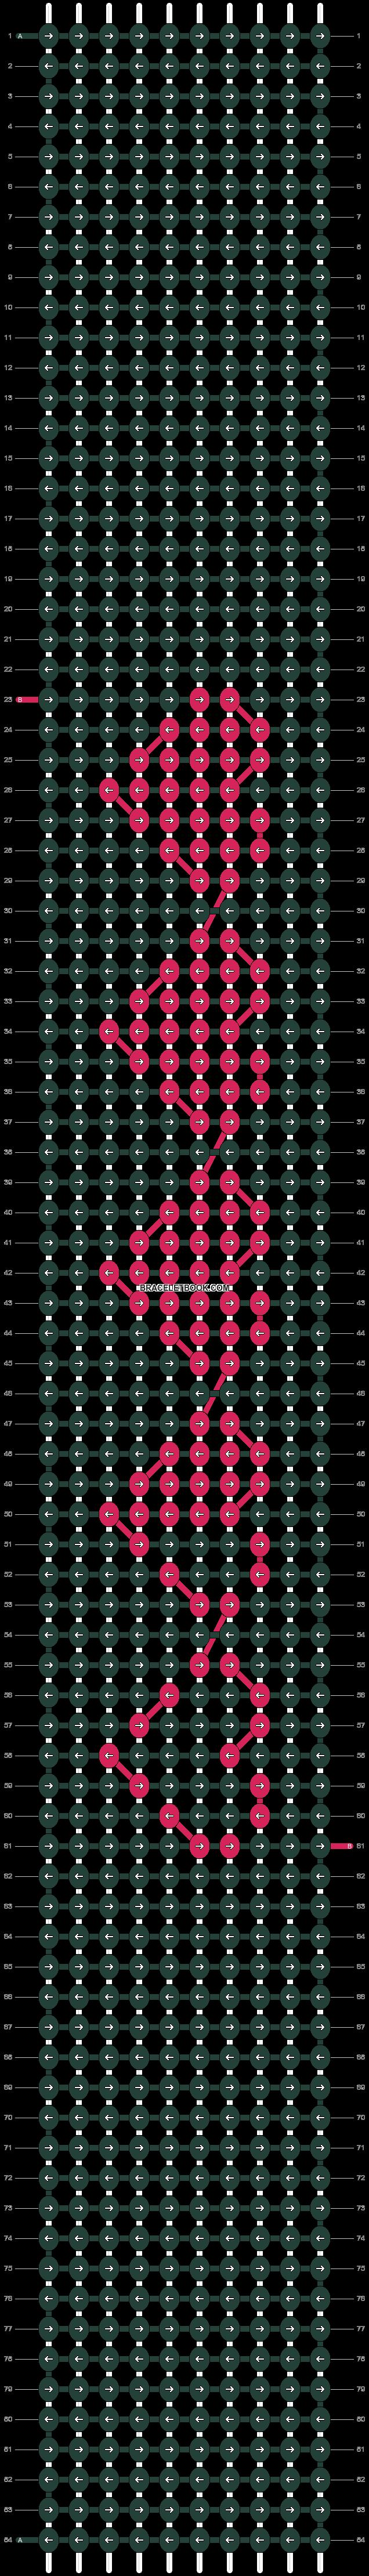 Alpha pattern #17376 variation #15282 pattern